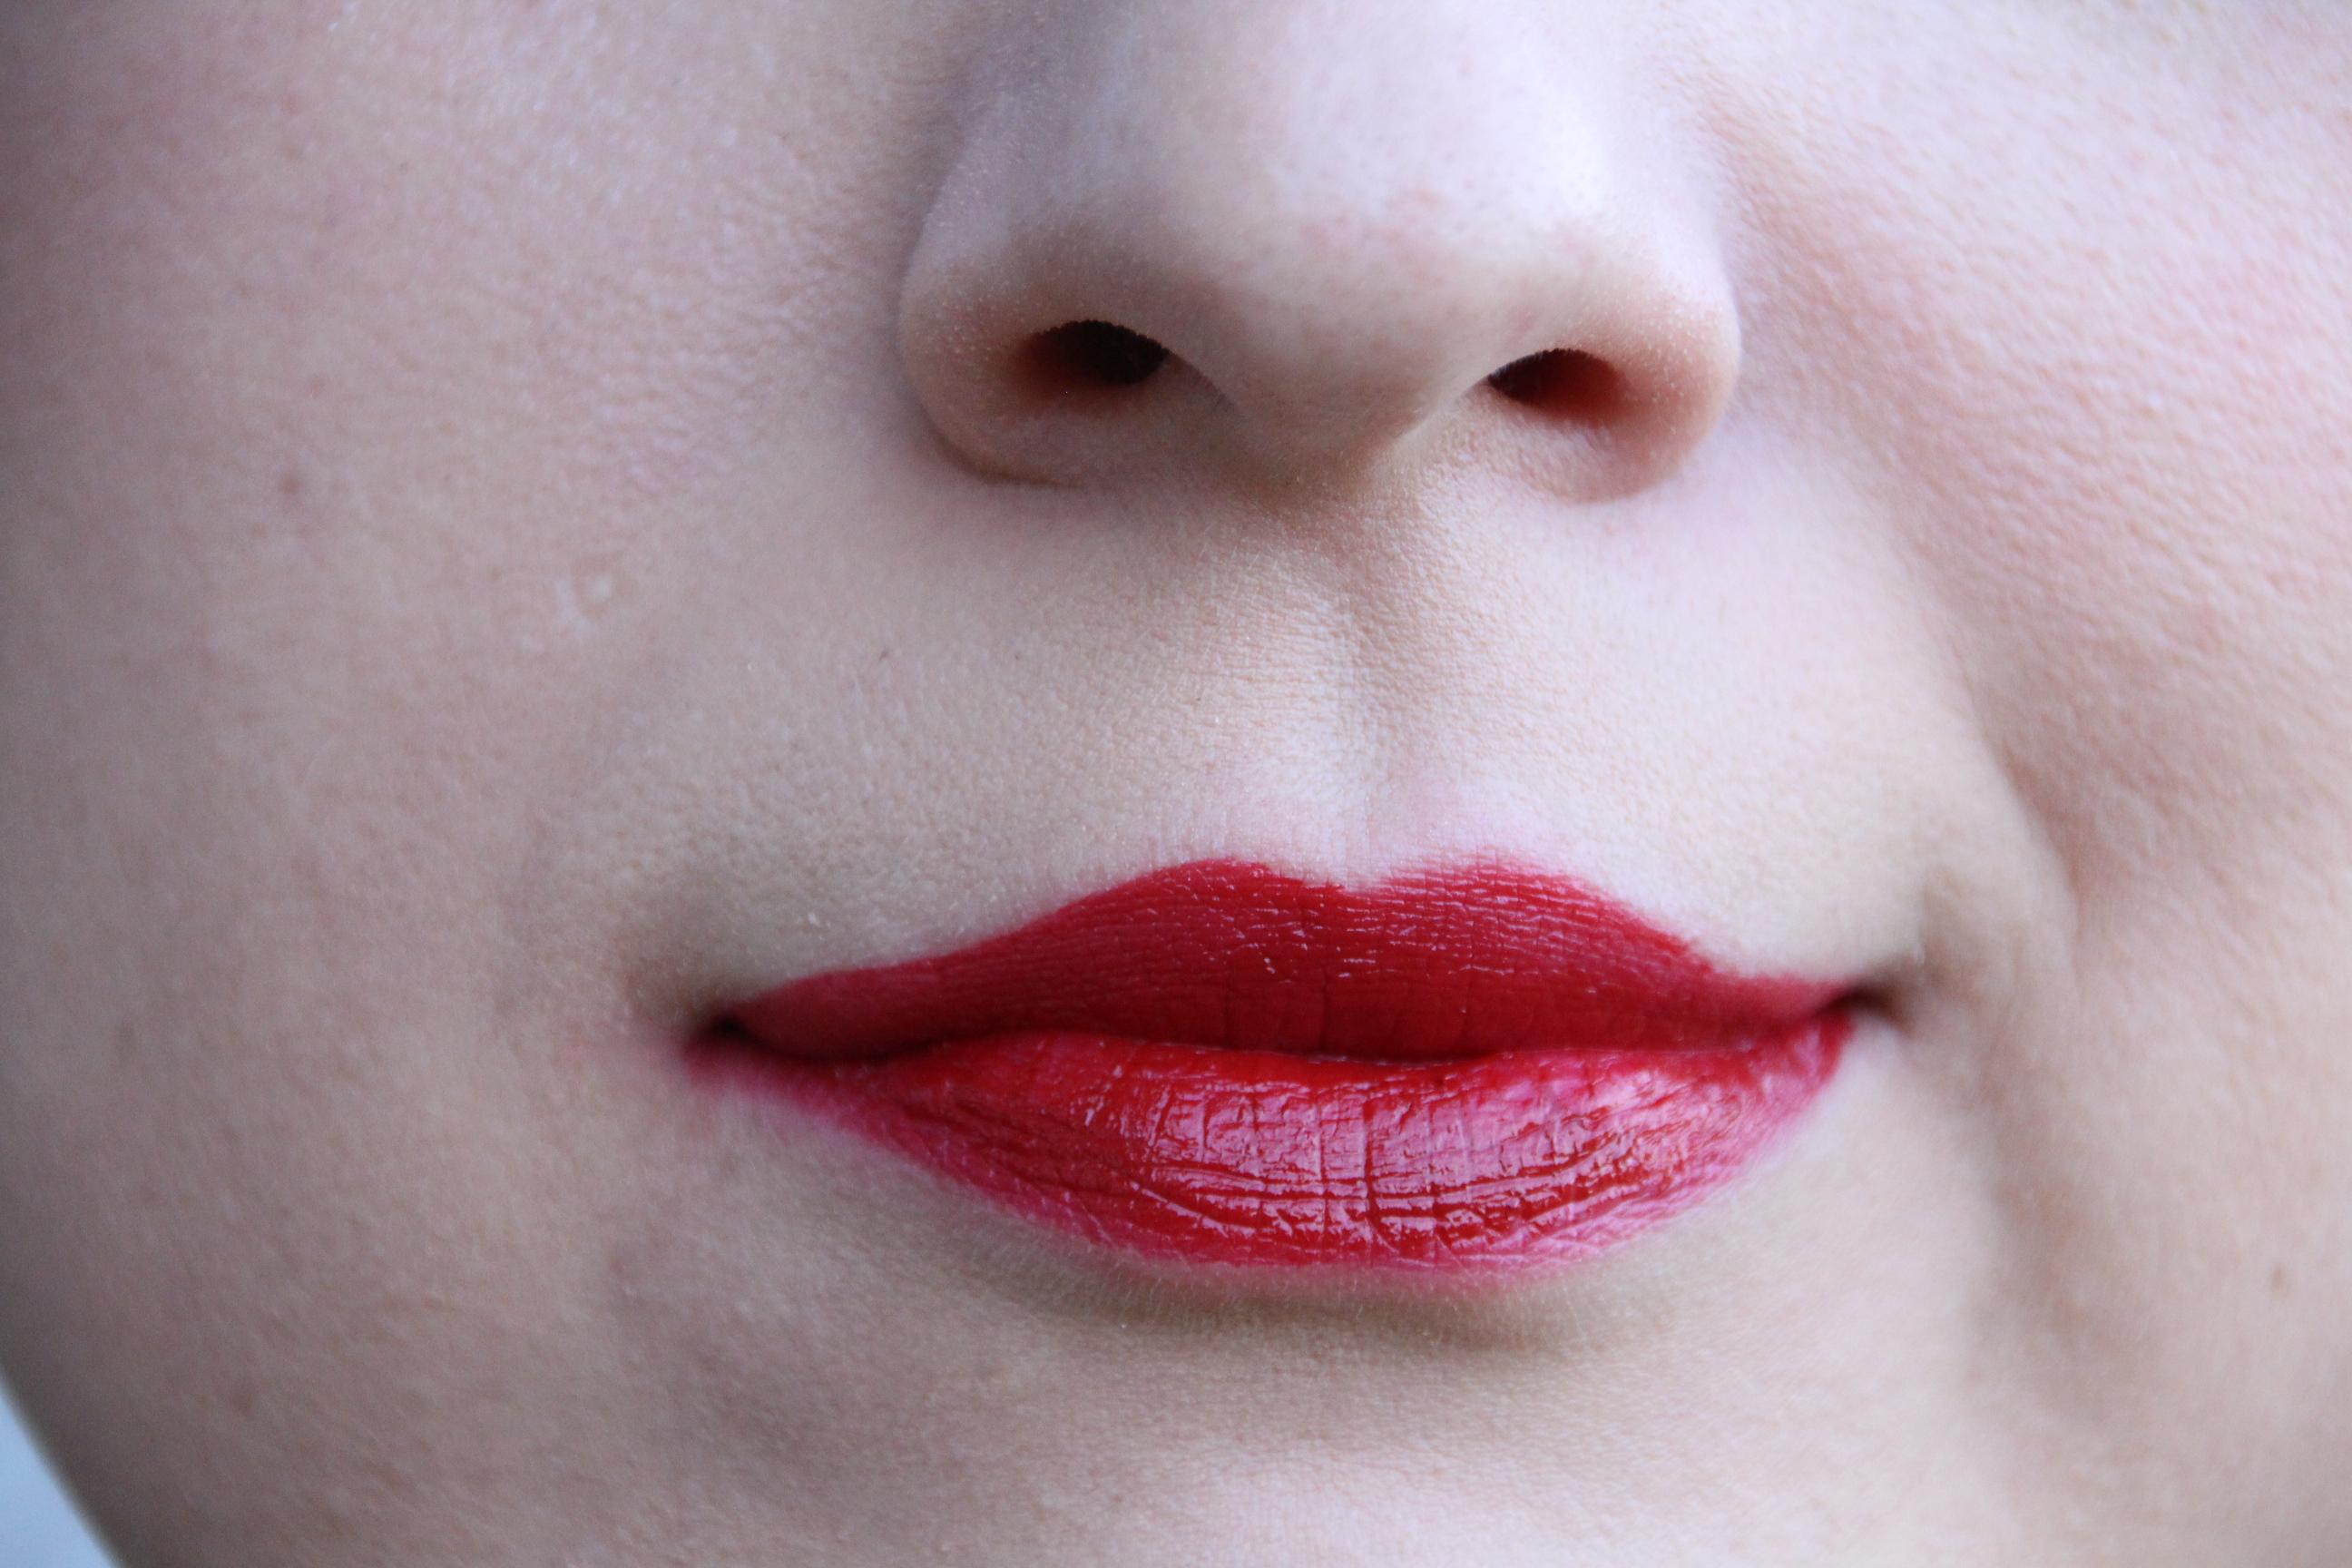 Lippenbereich_Nuance 501